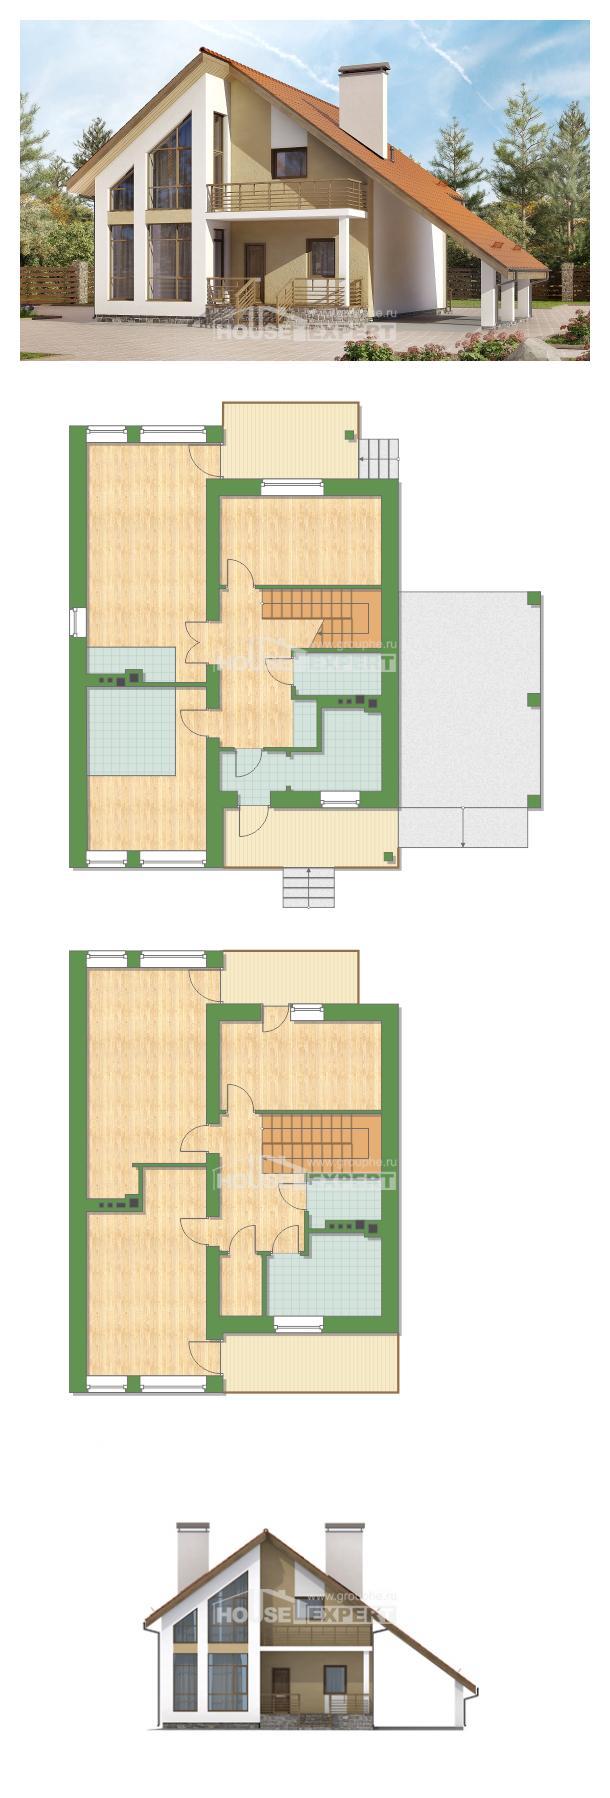 Projekt domu 170-009-R | House Expert